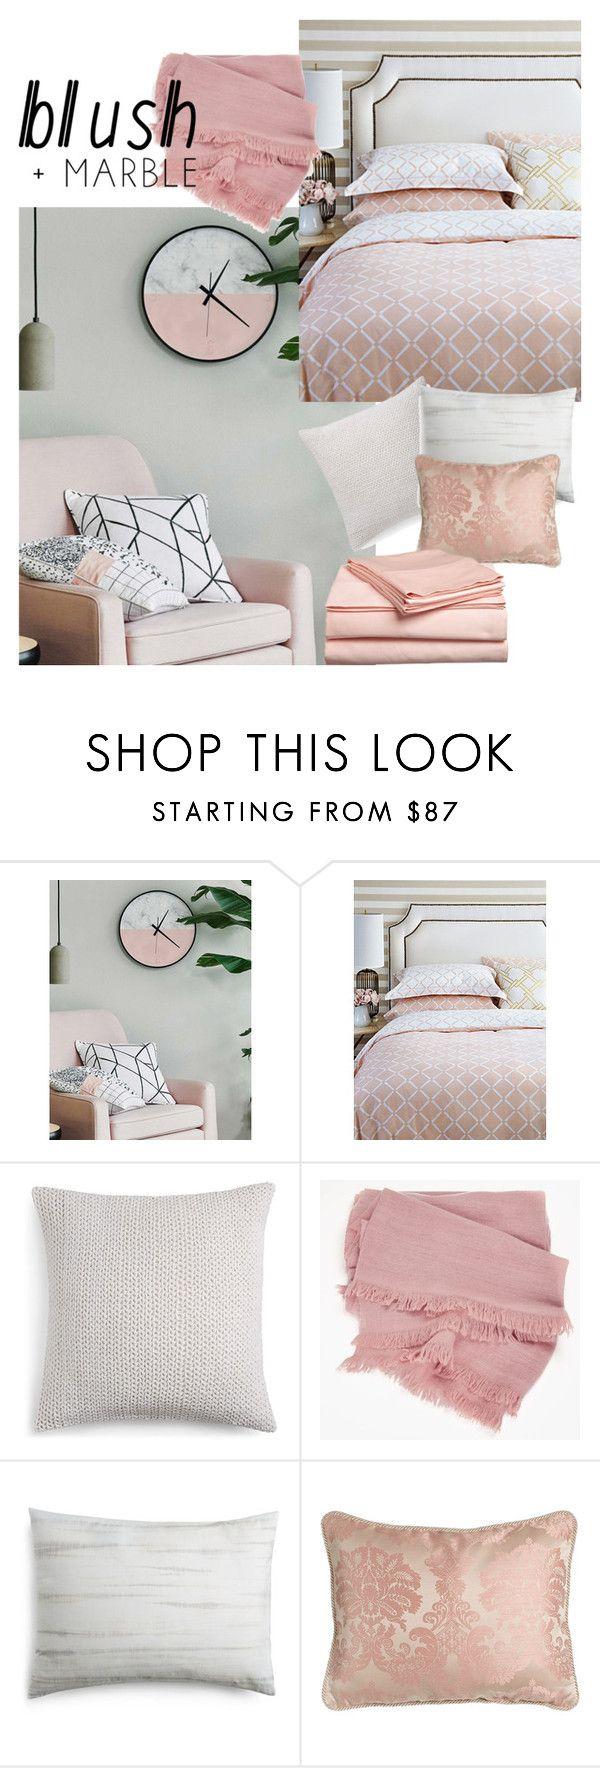 Designer Clothes Shoes Bags For Women Ssense Bedroom Decor Marble Bedroom Bedroom Inspirations